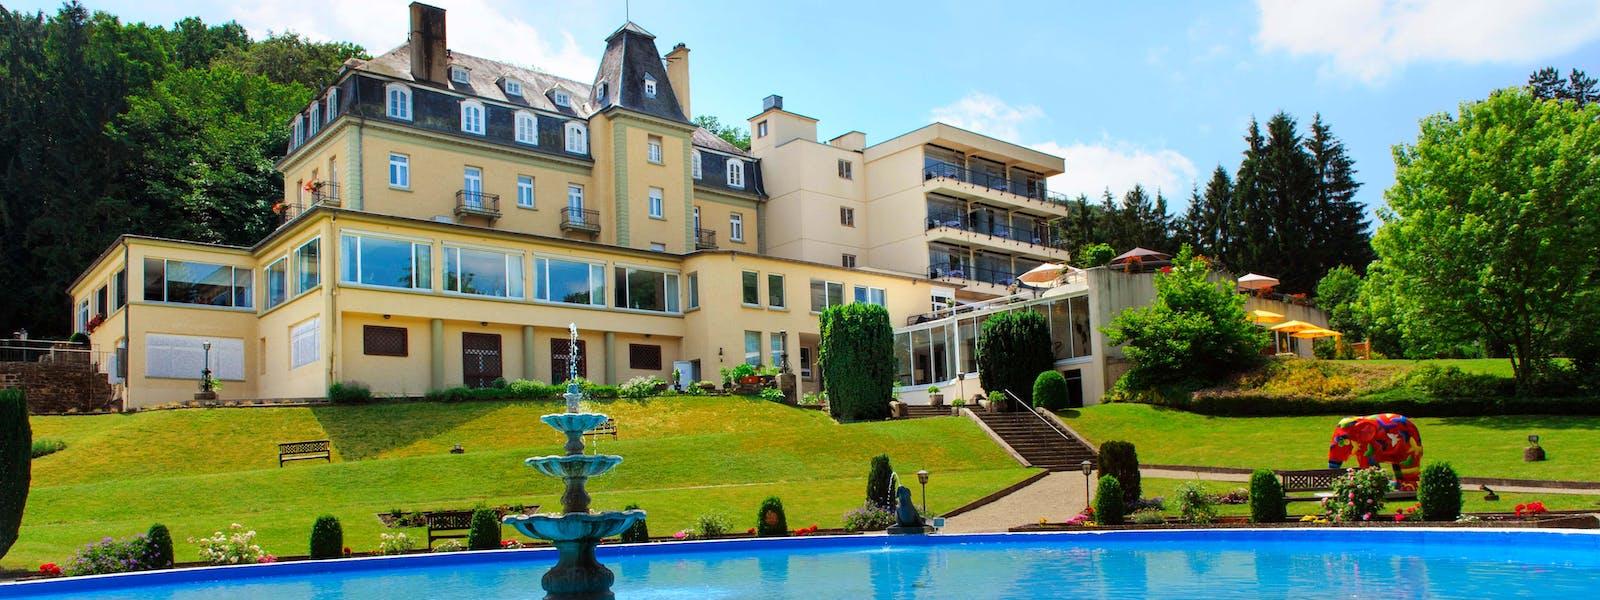 Hotel Bel-Air Romantik | Romantik Hotel Bel-Air Sport & Wellness